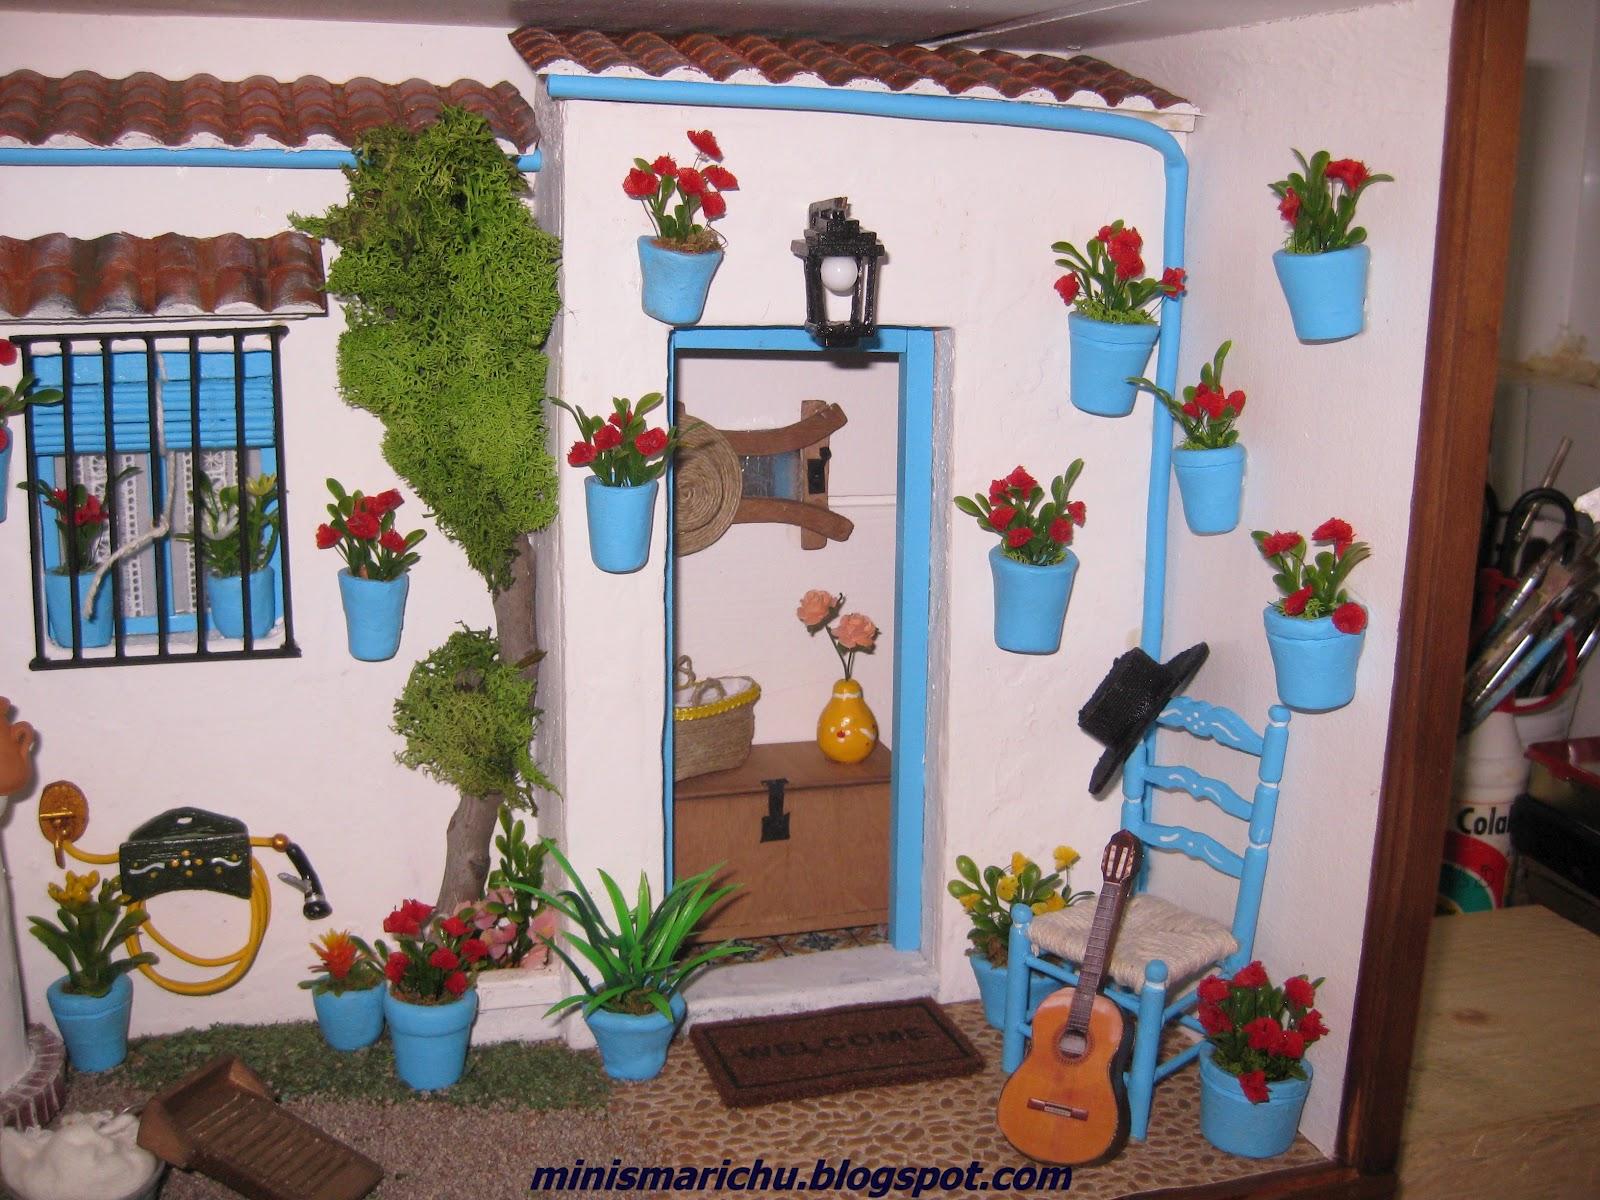 Las minis de marichu patio cordob s for Patios andaluces decoracion